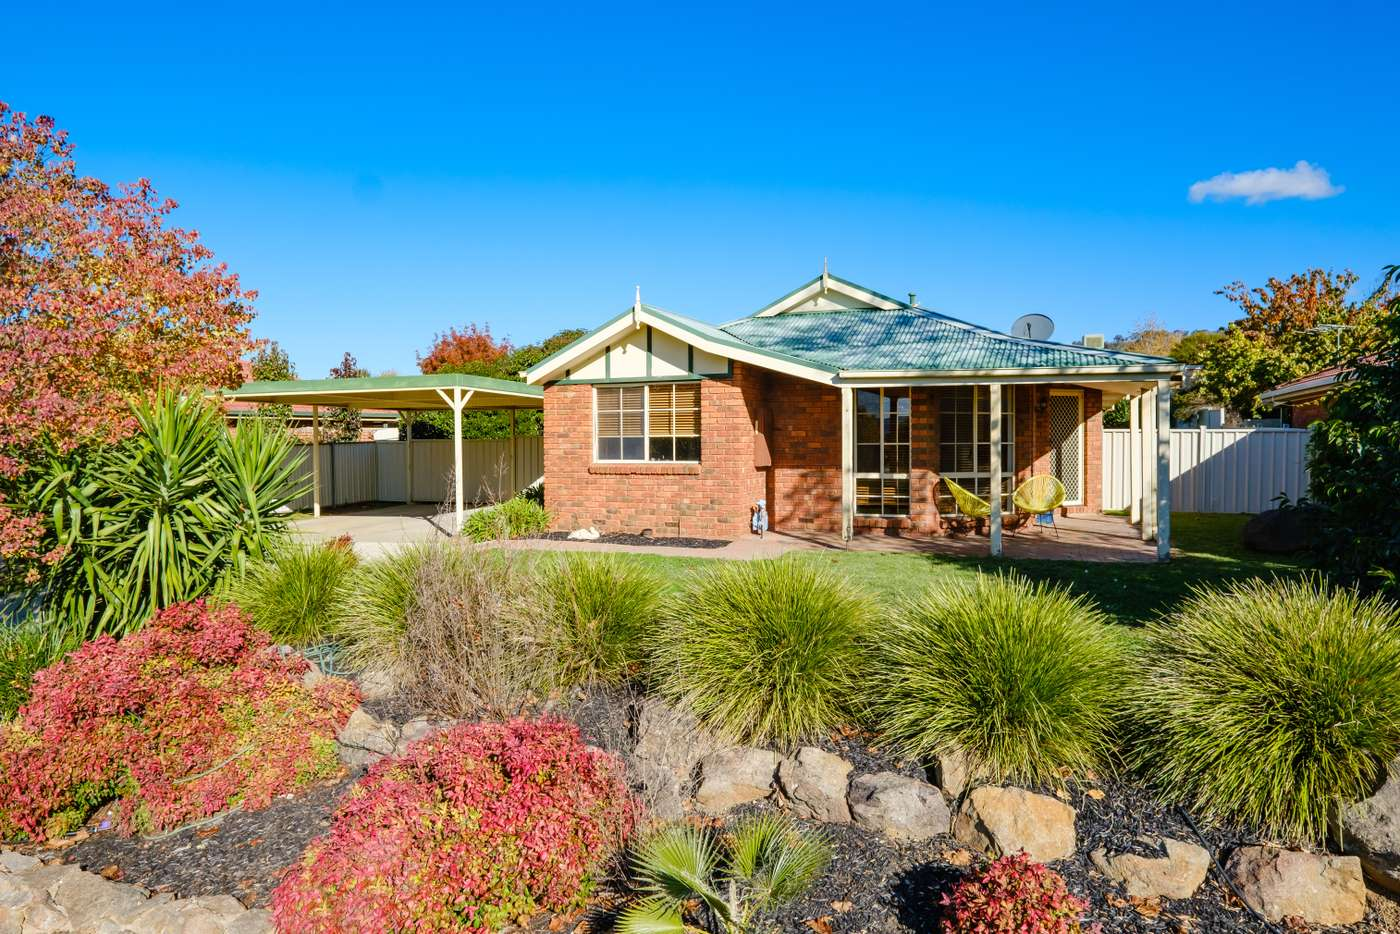 Main view of Homely house listing, 35 NIGHTINGALE AVENUE, Wodonga VIC 3690